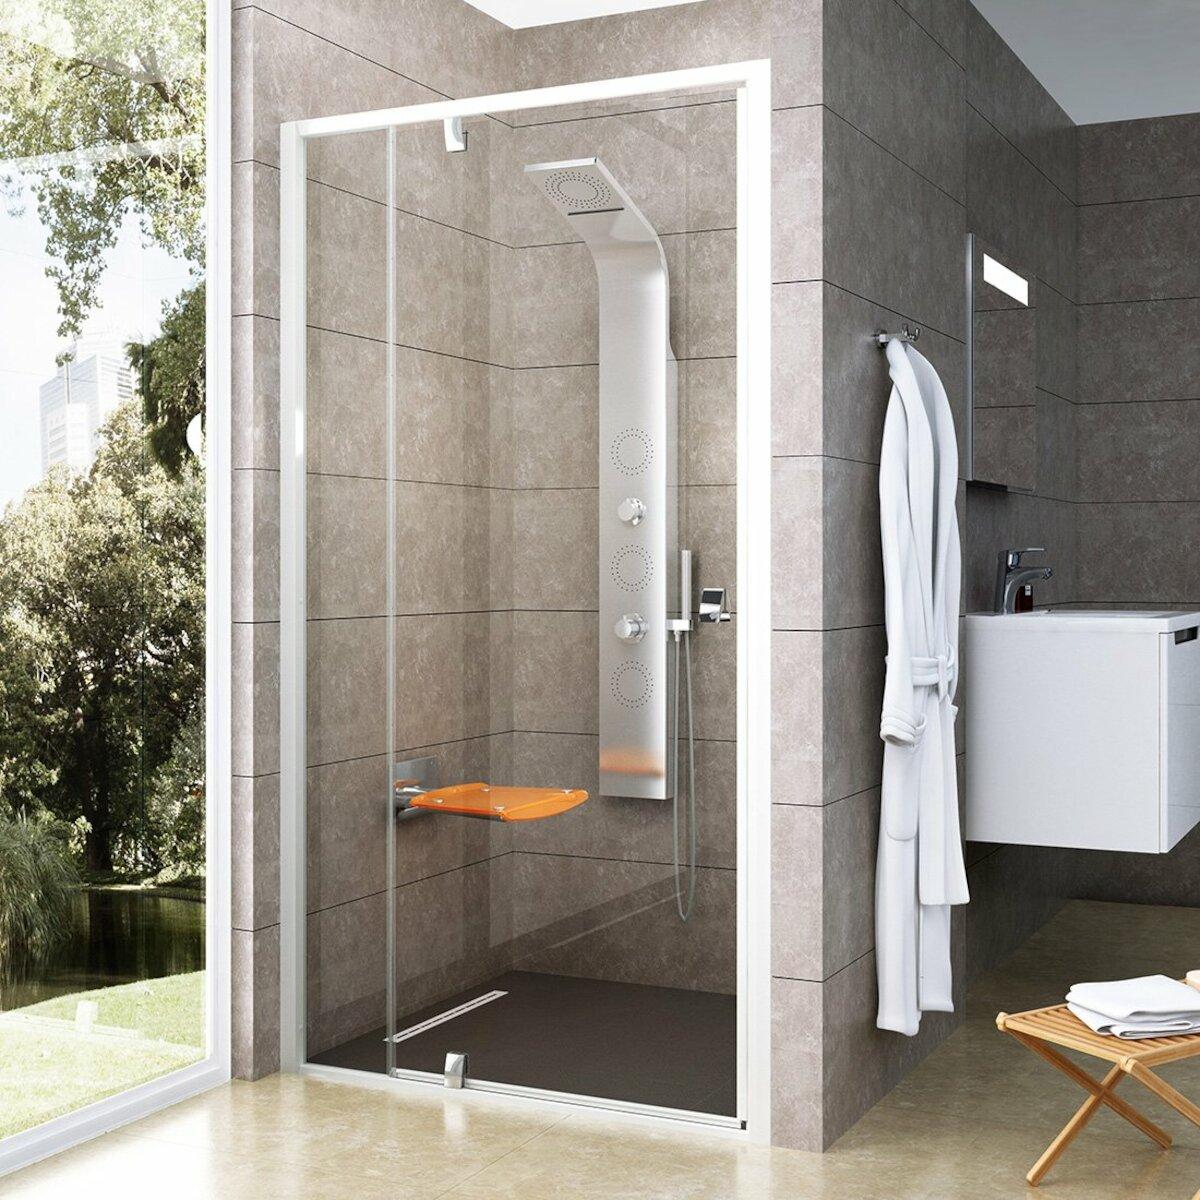 Sprchové dvere 110x190 cm Ravak Pivot biela 03GD0100Z1